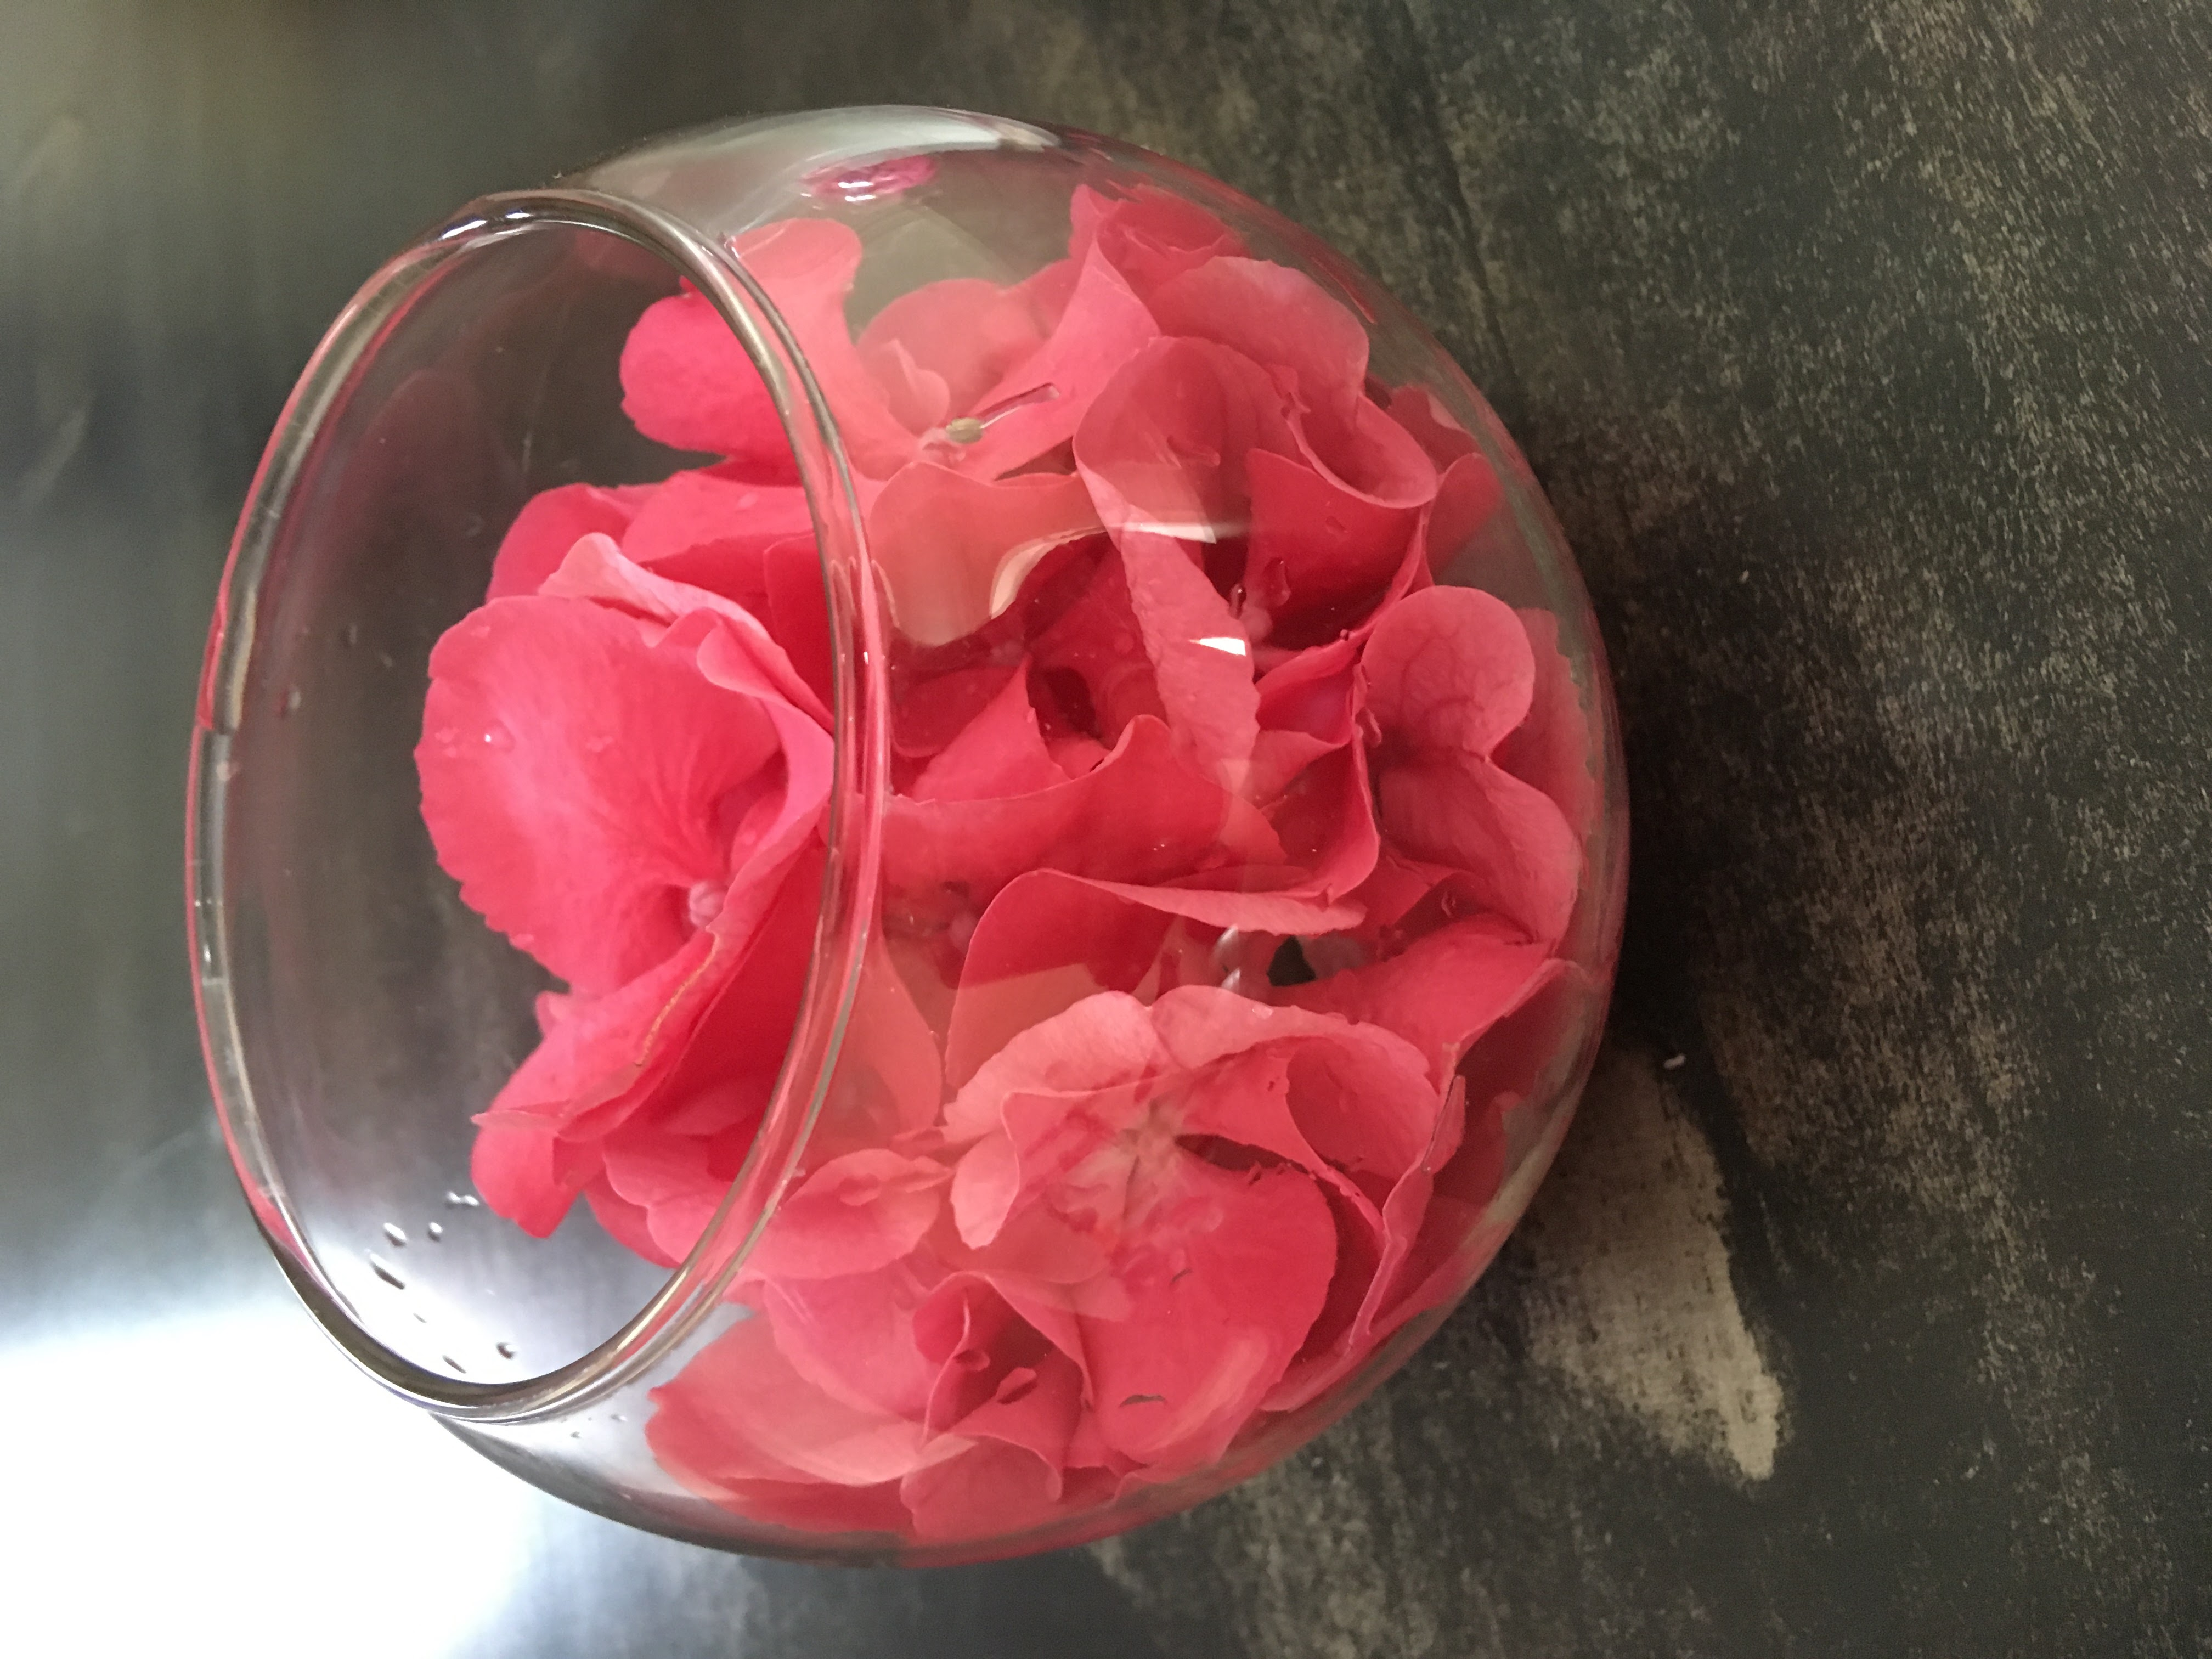 hortensias fleuriste montpellier